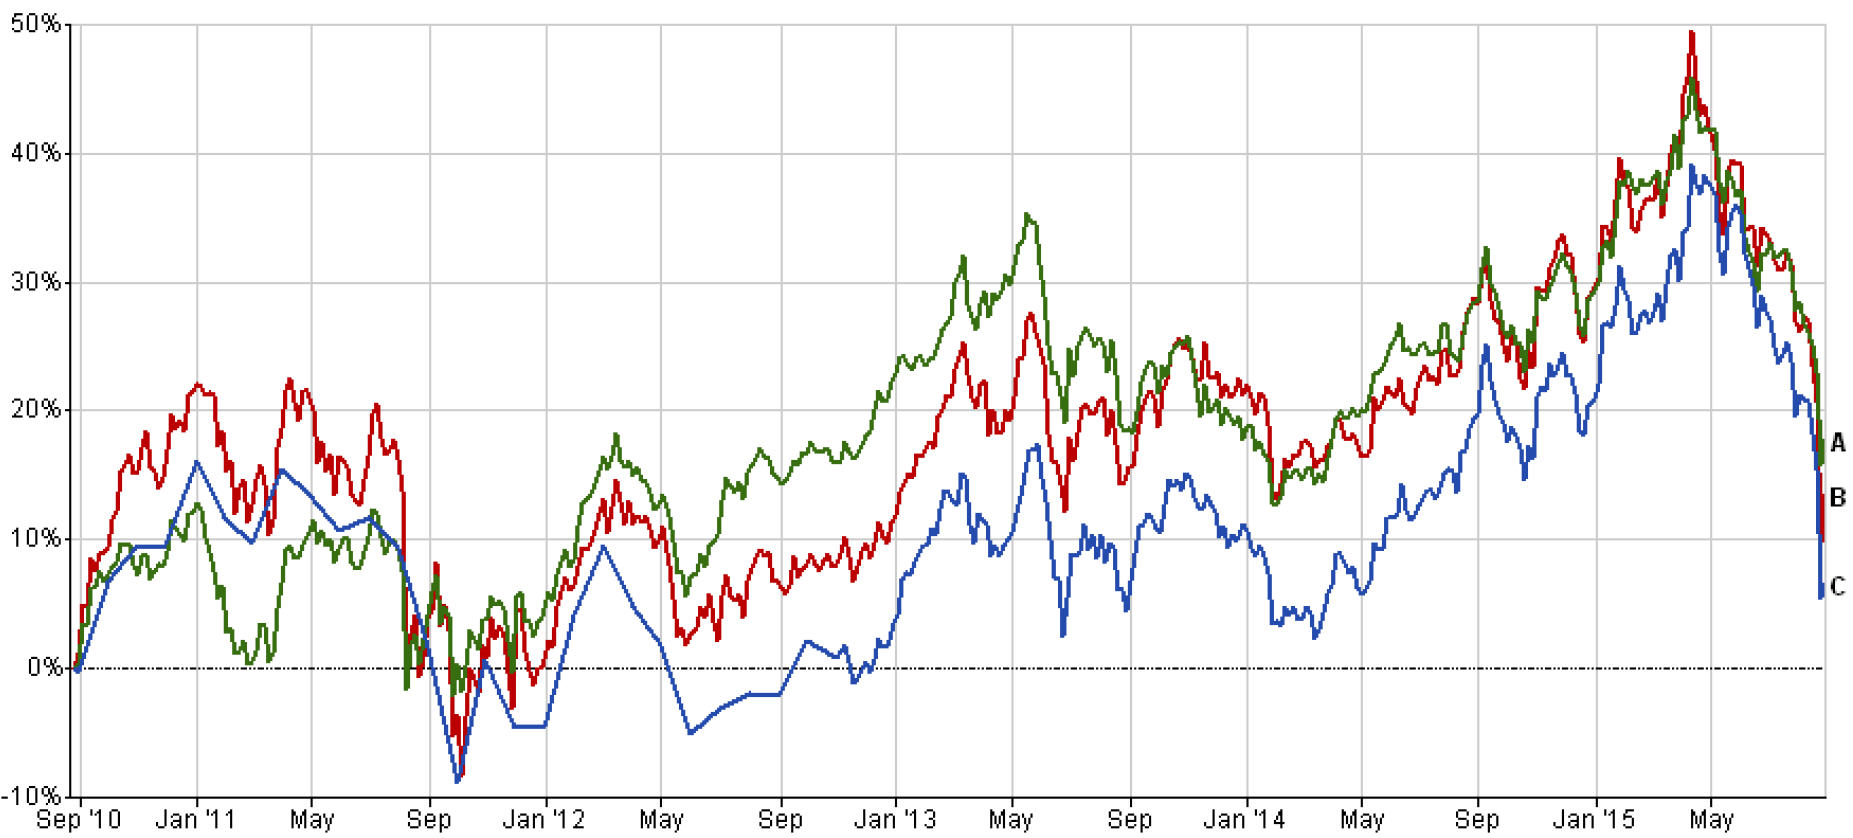 Emerging market funds' performance